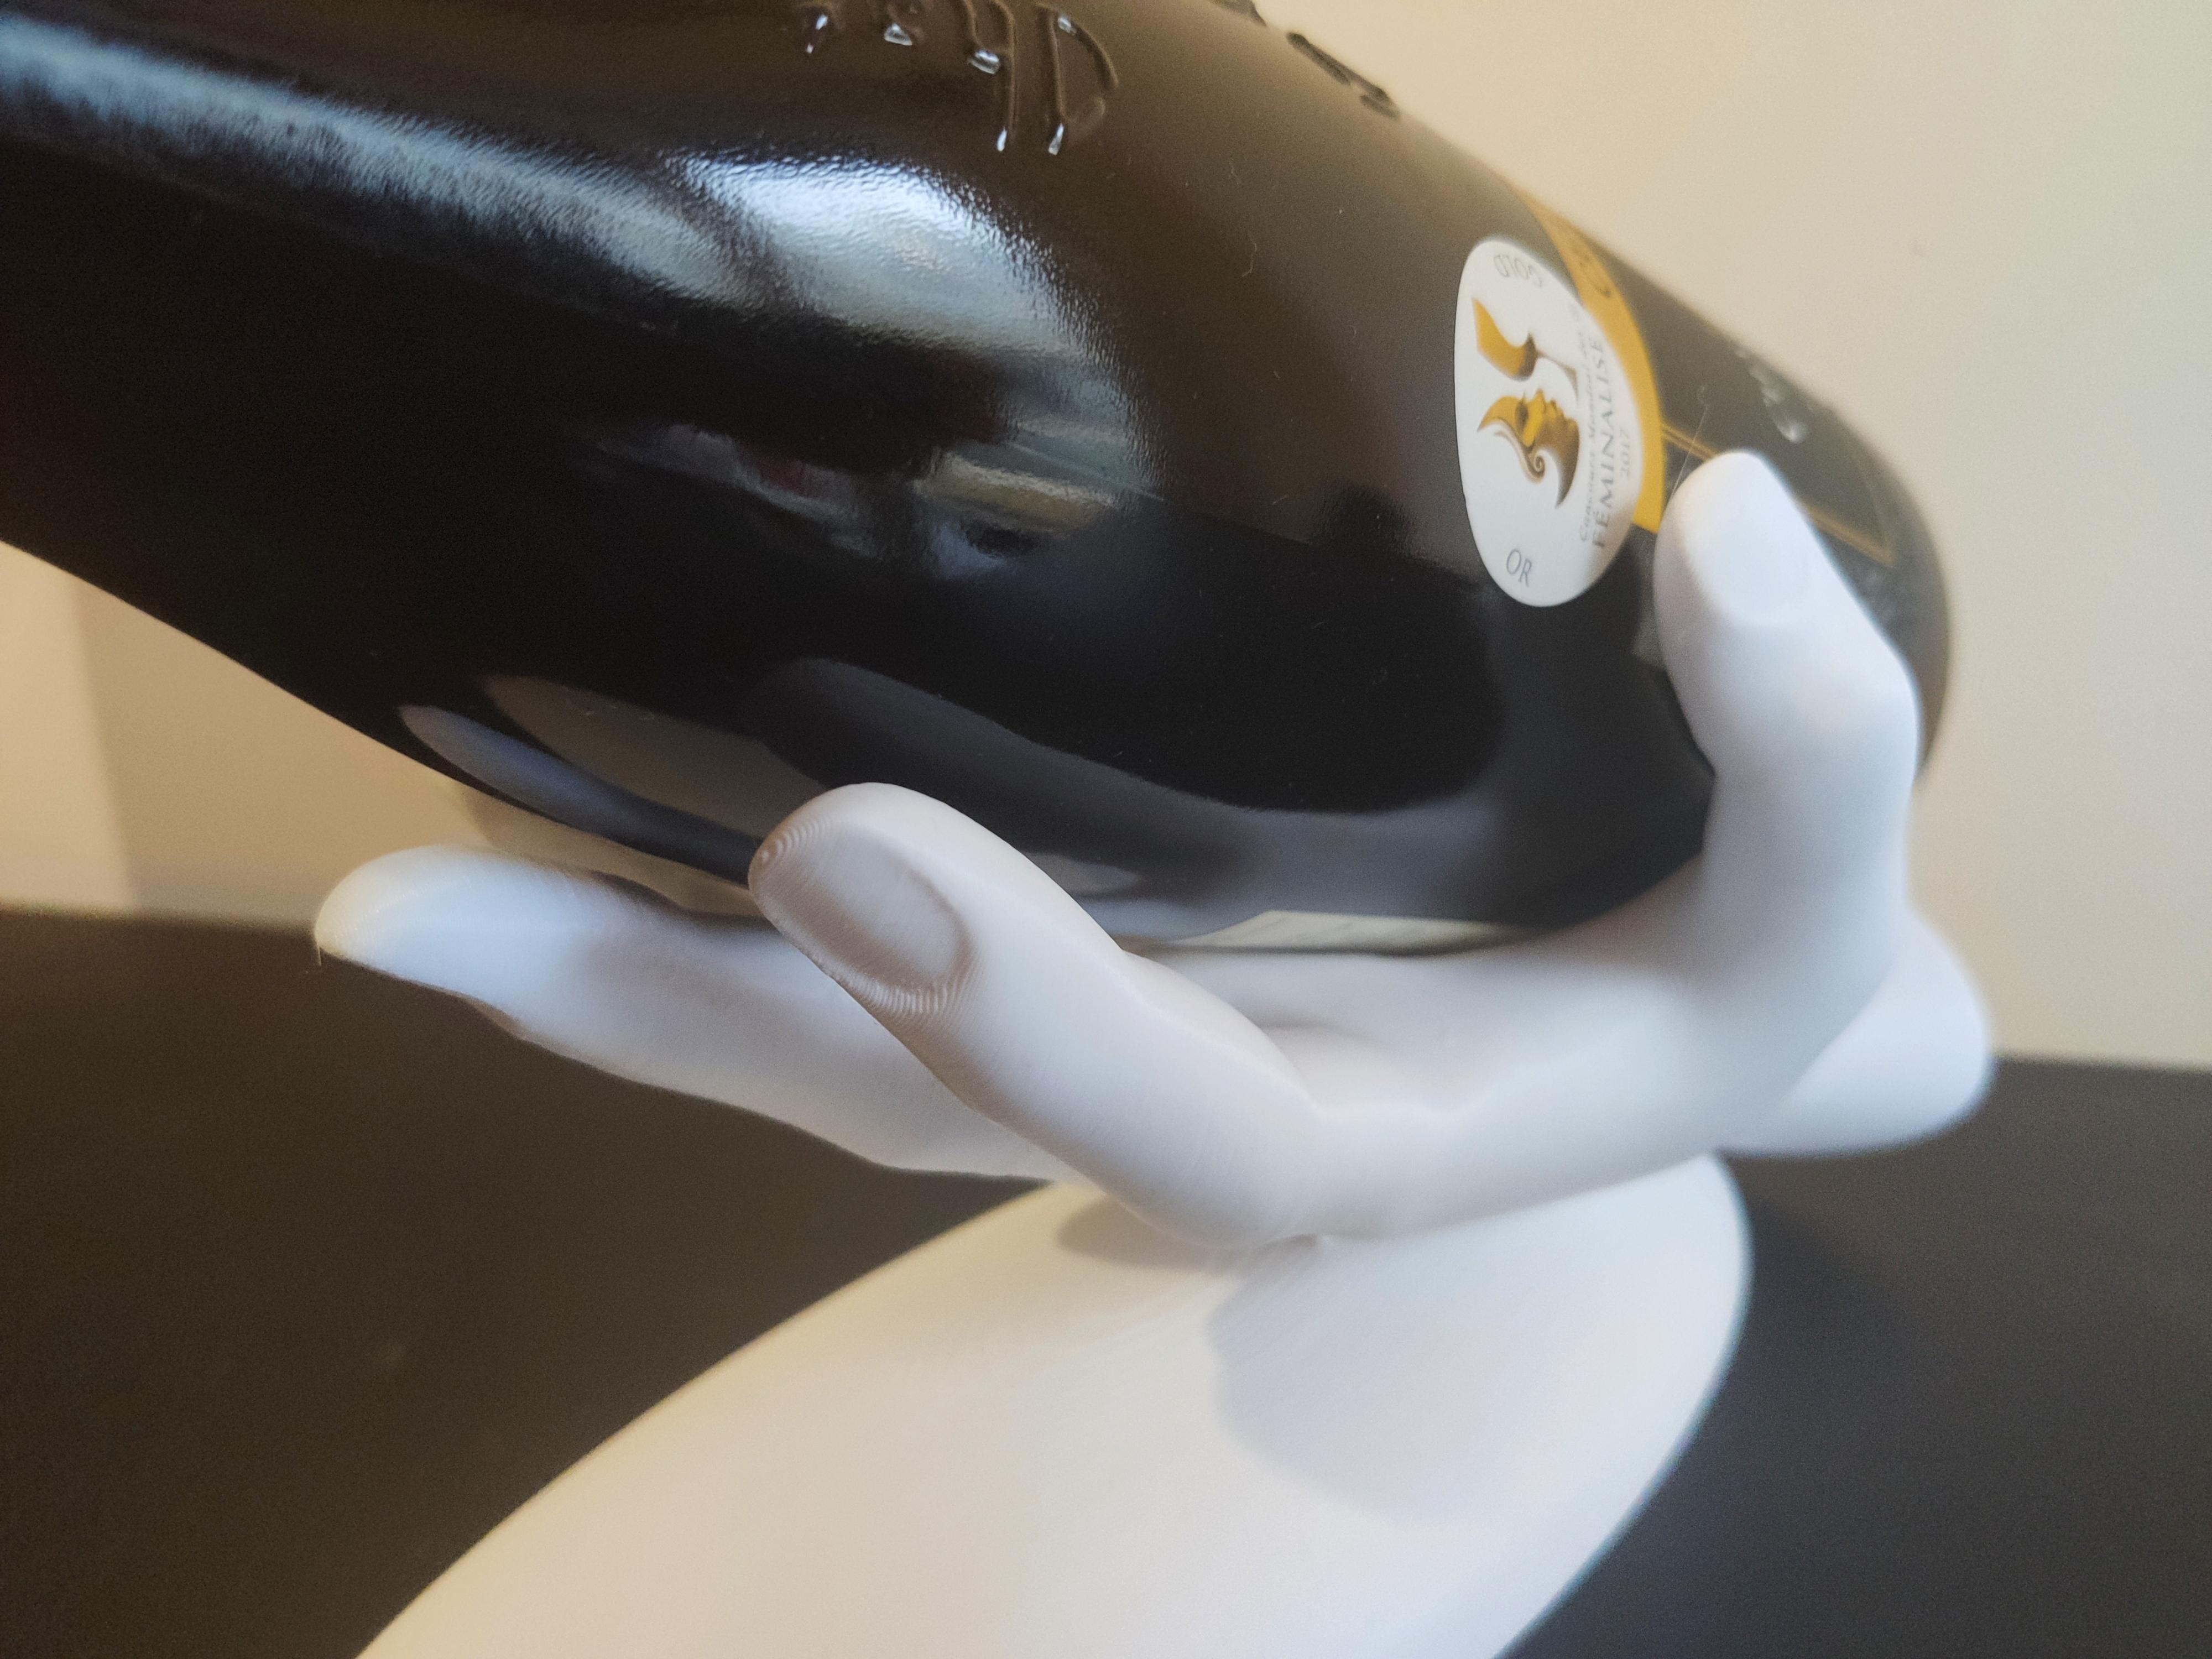 IMG_20210112_103201.jpg Descargar archivo STL Porta botella de vino de mano • Modelo imprimible en 3D, koukwst